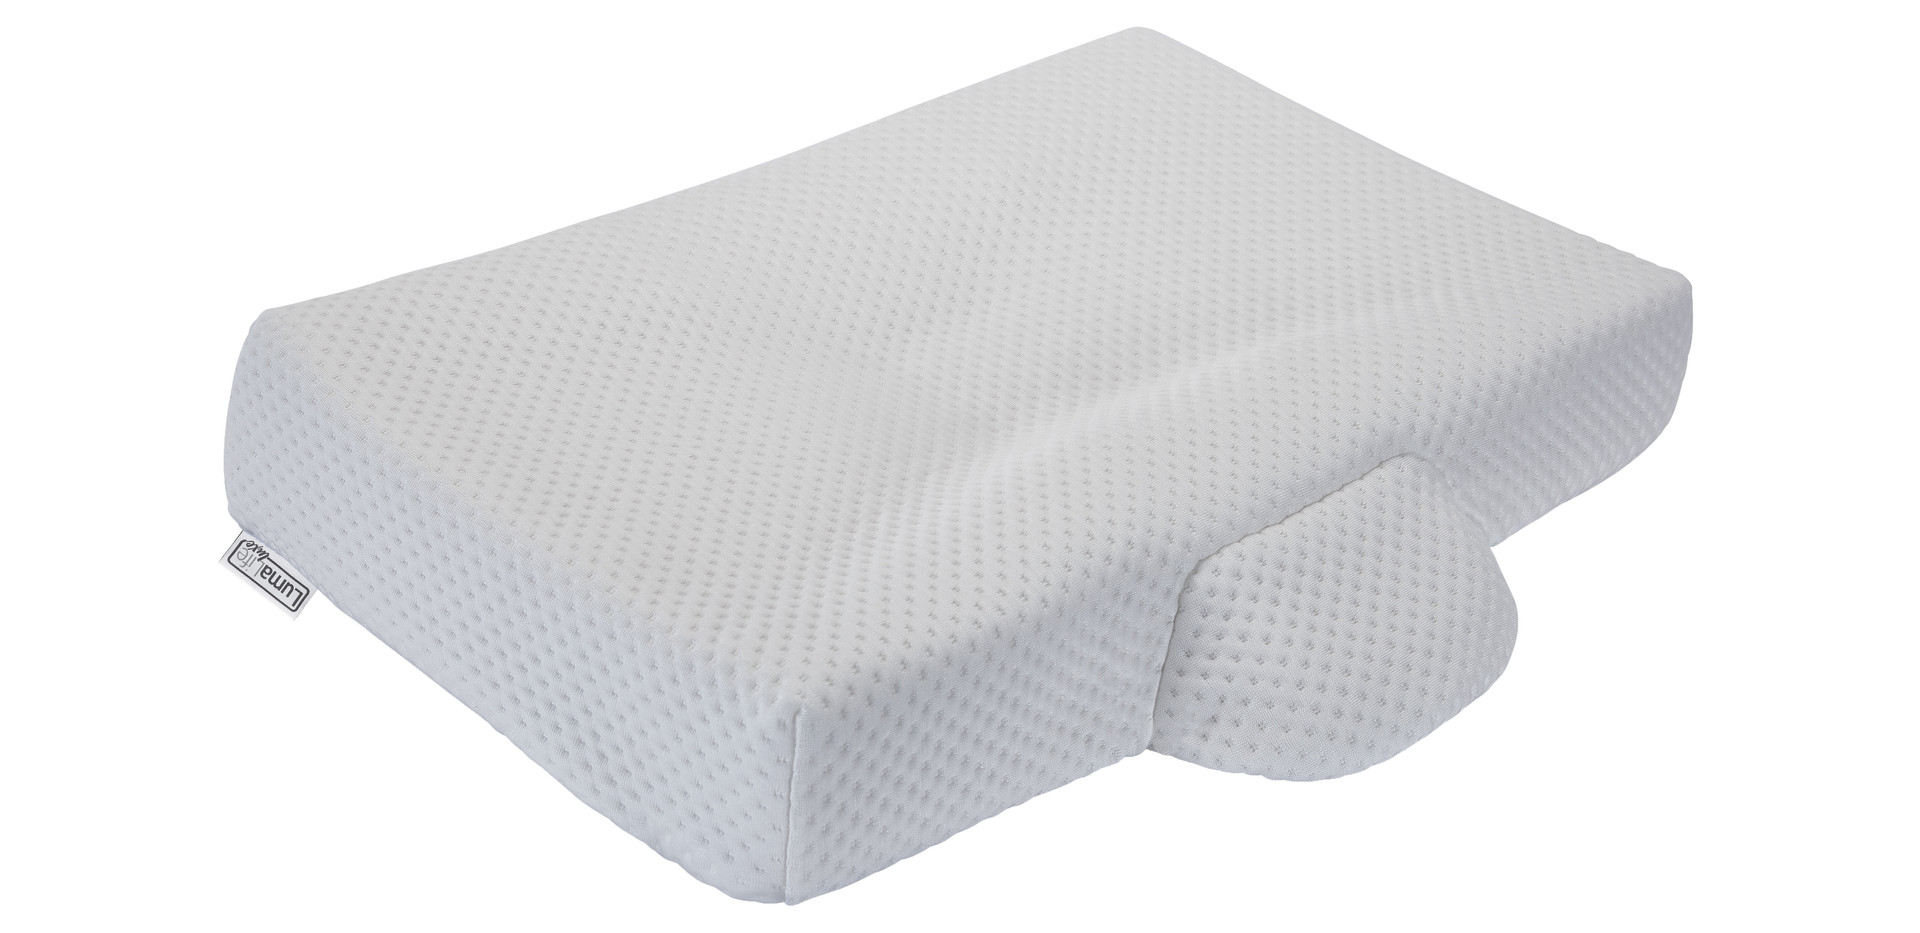 LumaLife Luxe Super Slim Orthopedic Contour Pillow in Tencel Cover